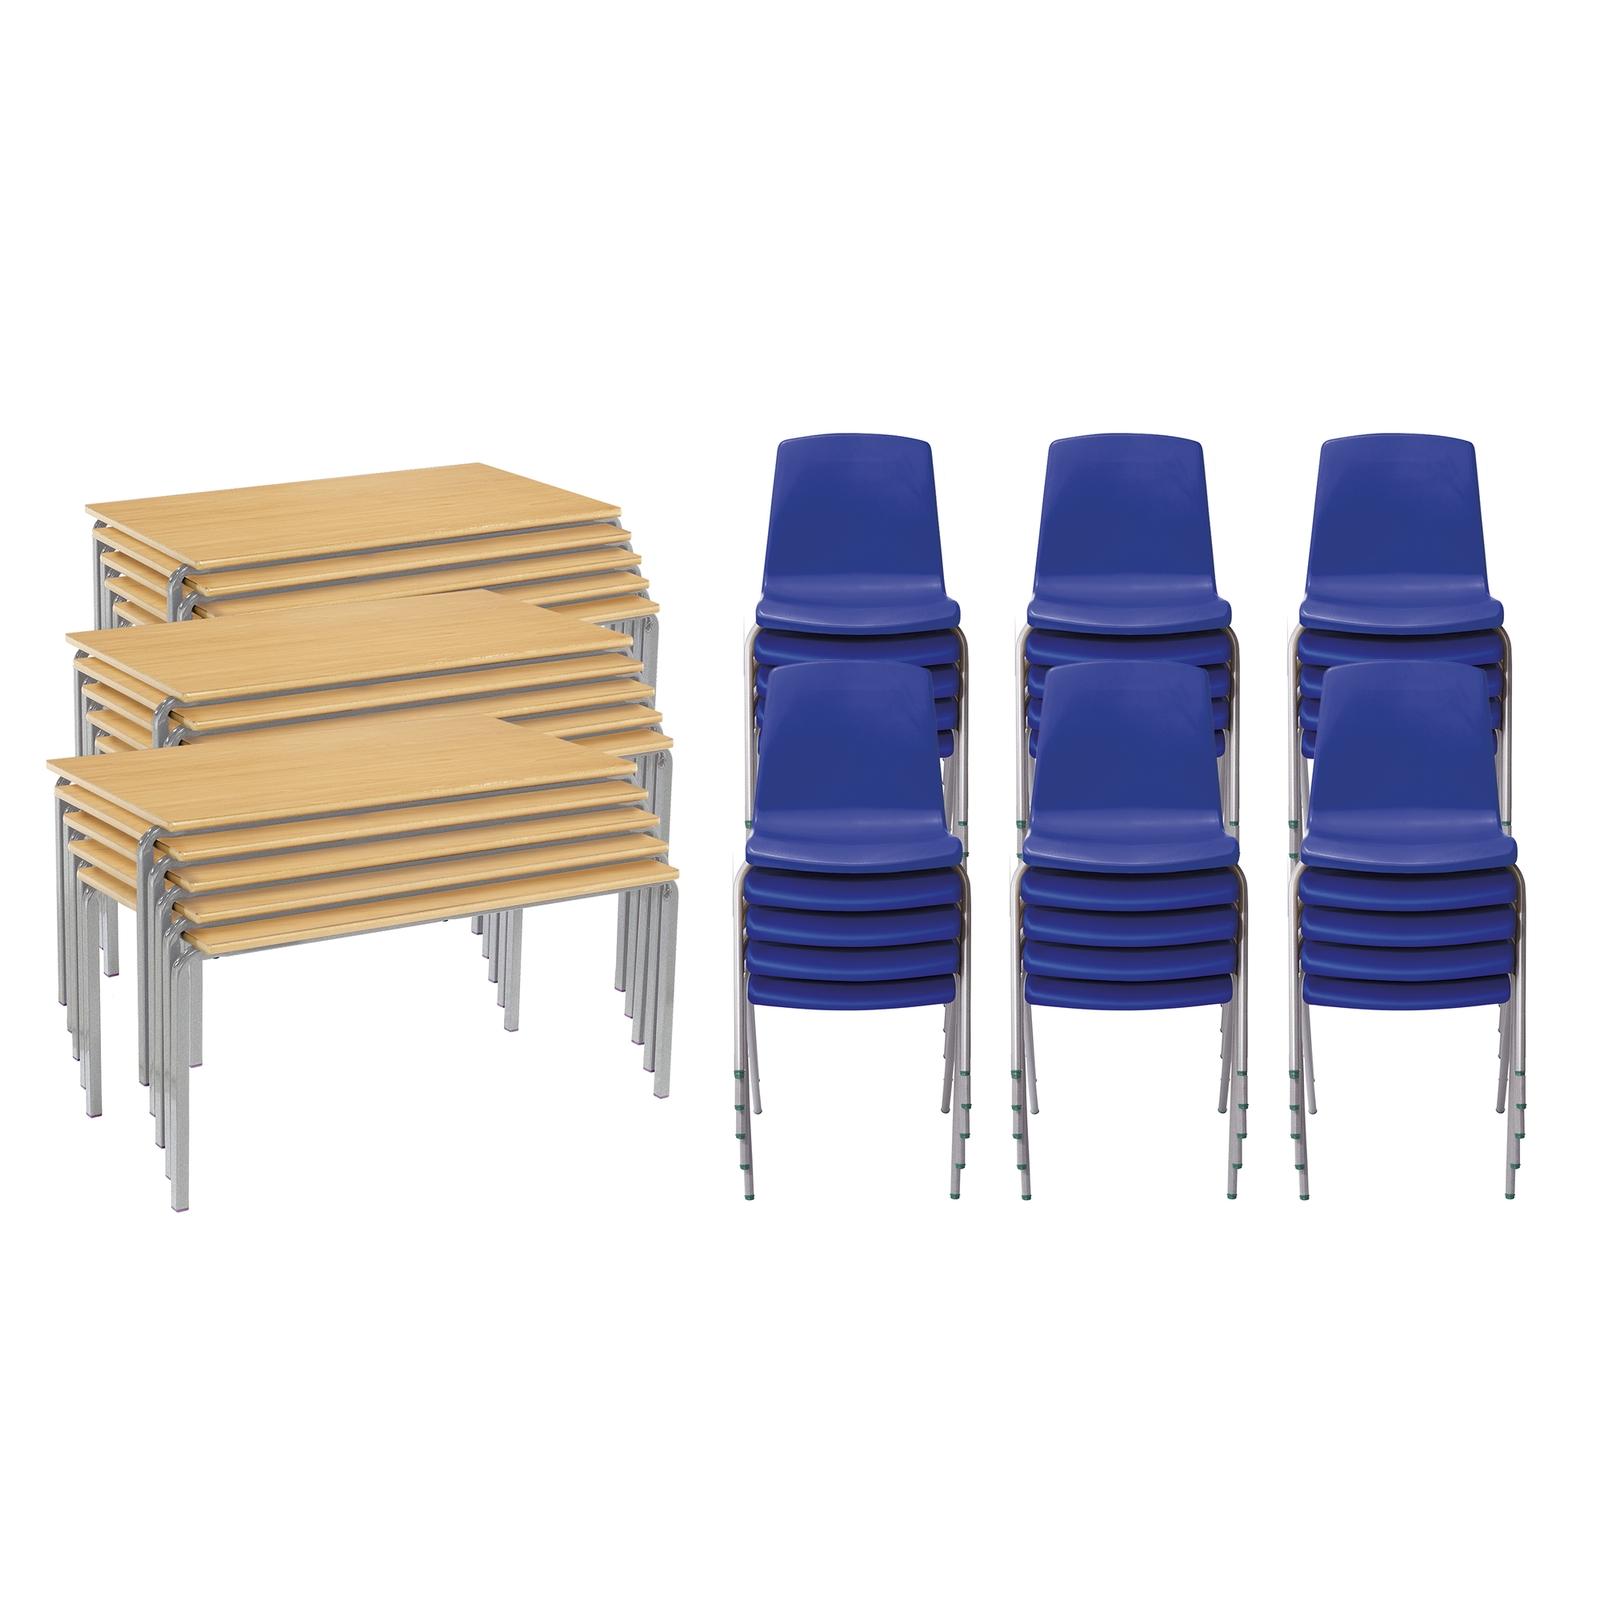 CM 15FW Bch Tables 30Blue Chairs 8-11yr